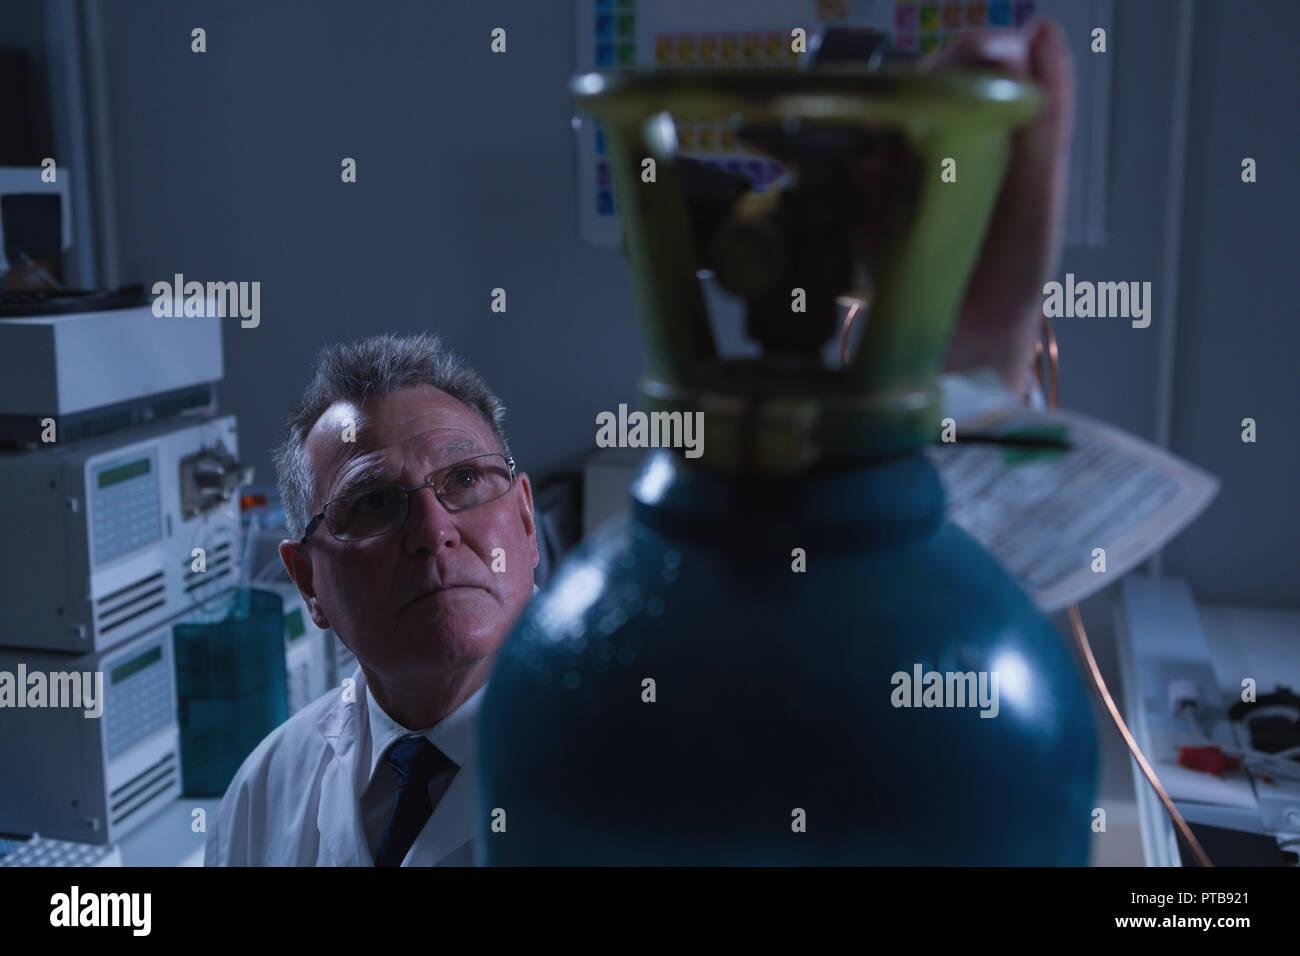 Male scientist adjusting pressure gauge of cylinder in laboratory - Stock Image